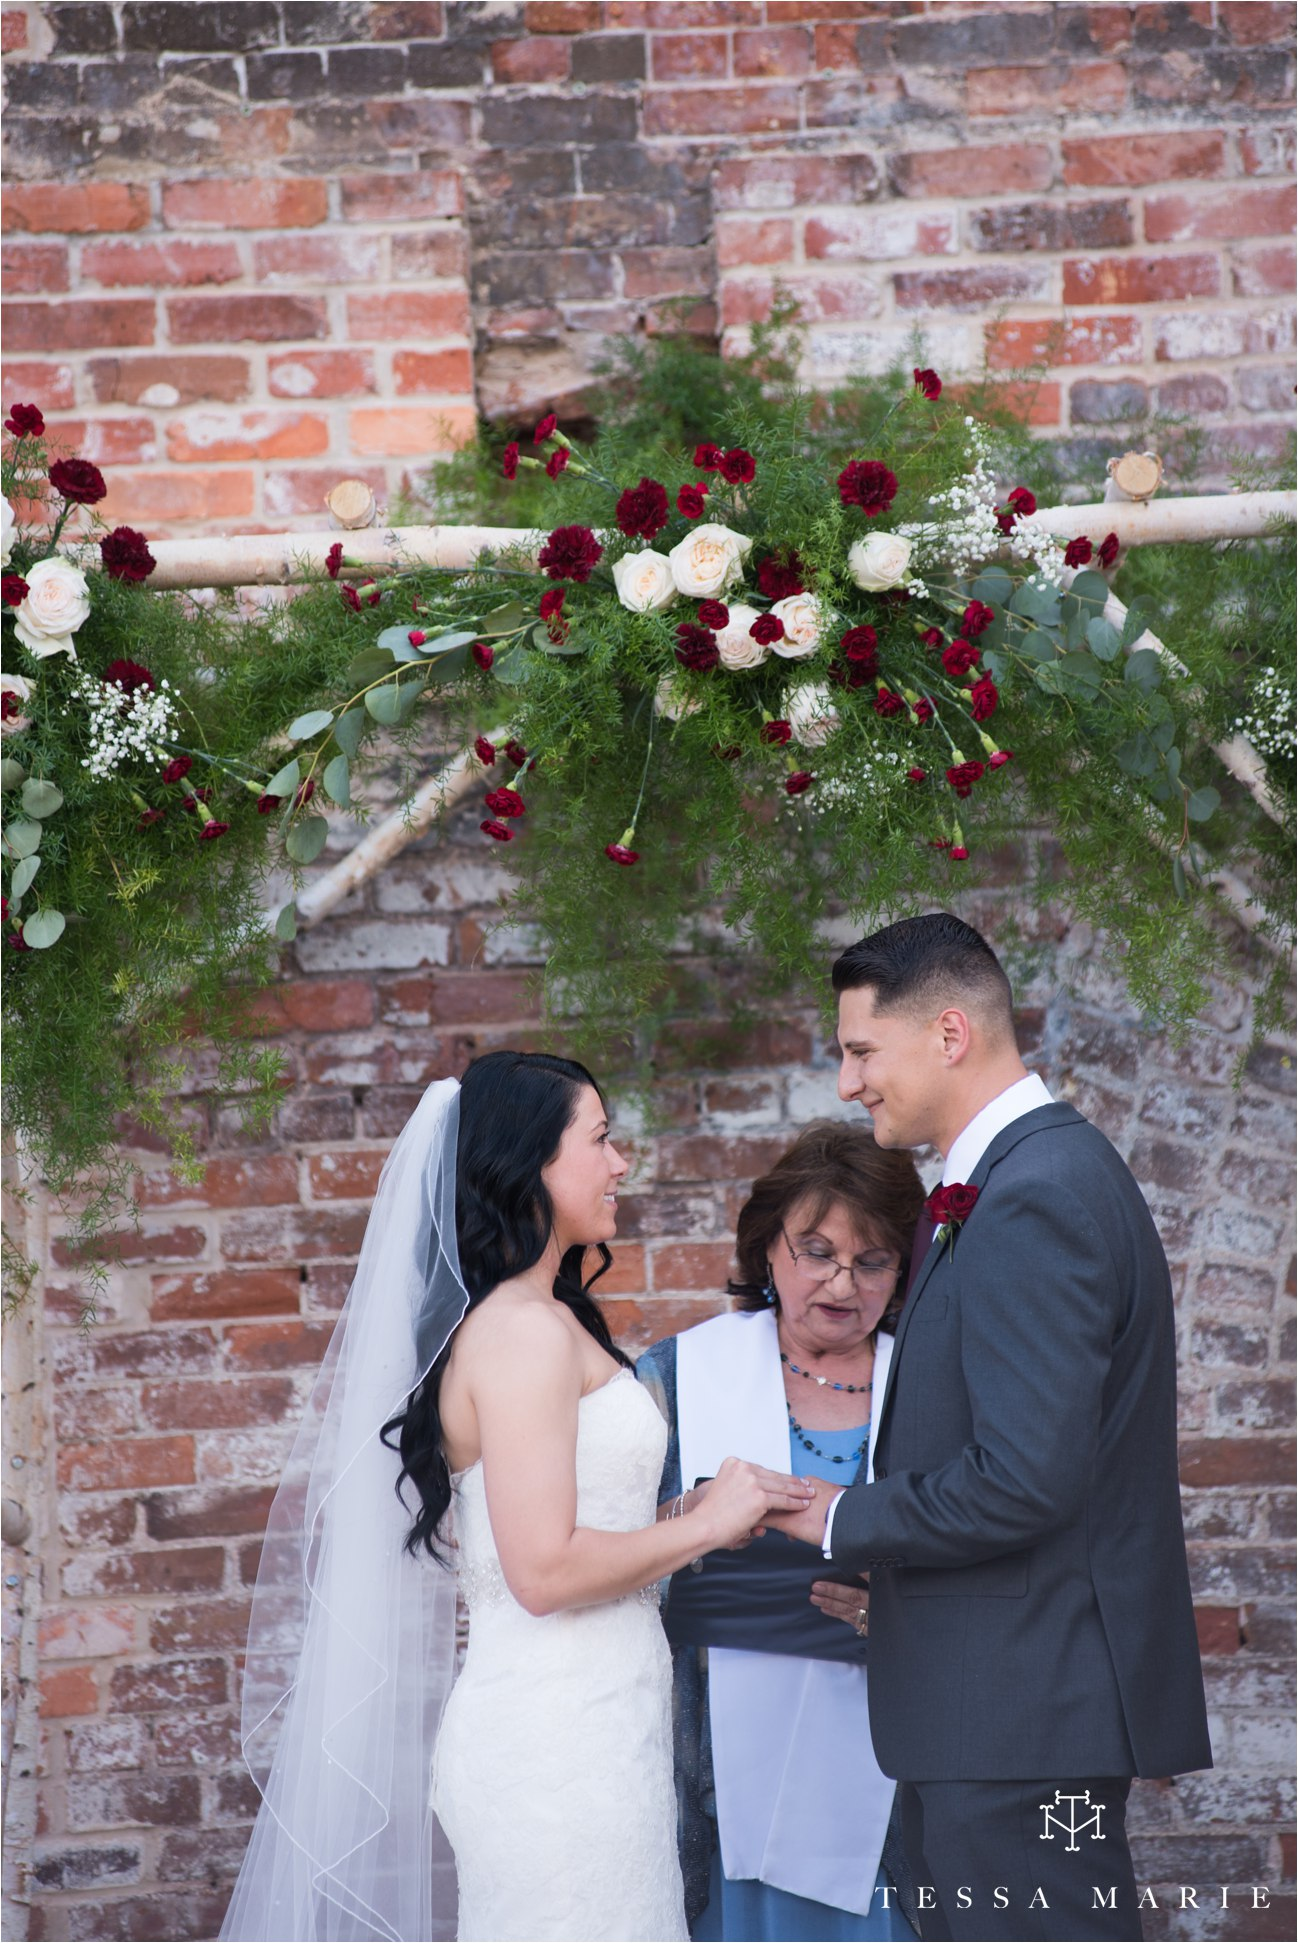 tessa_marie_weddings_rivermill_event_centere_candid_outdoor_wedding_photos_0218